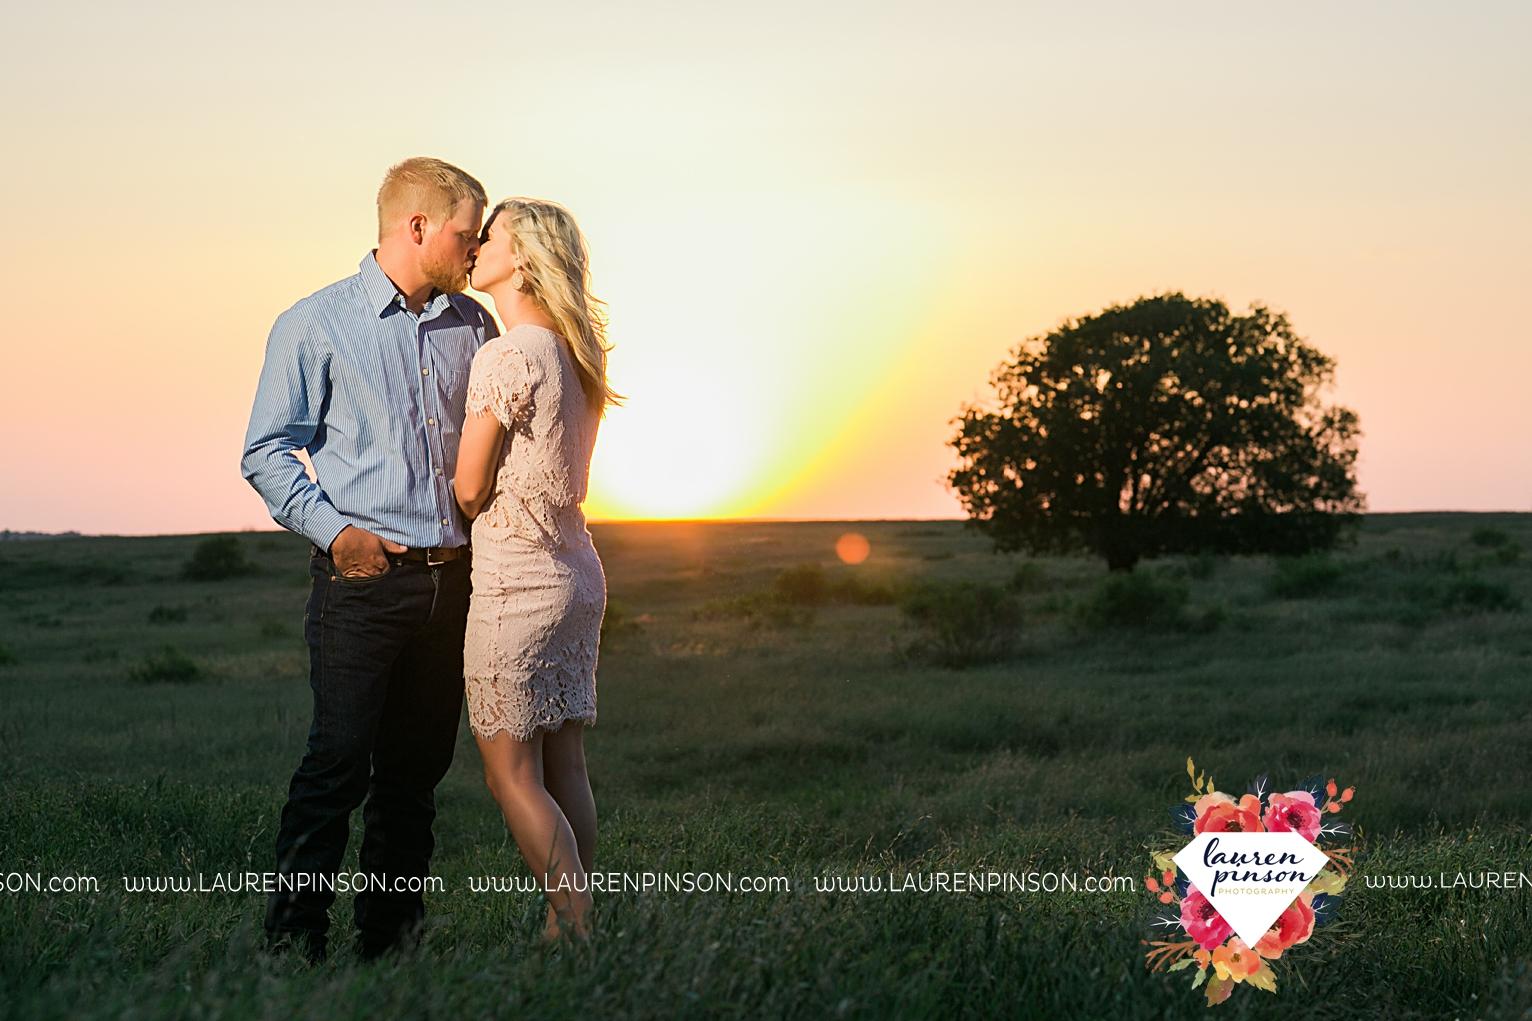 wichita-falls-texas-wedding-photographer-scotland-texas-engagement-session-country-barn-field-windthorst_2771.jpg